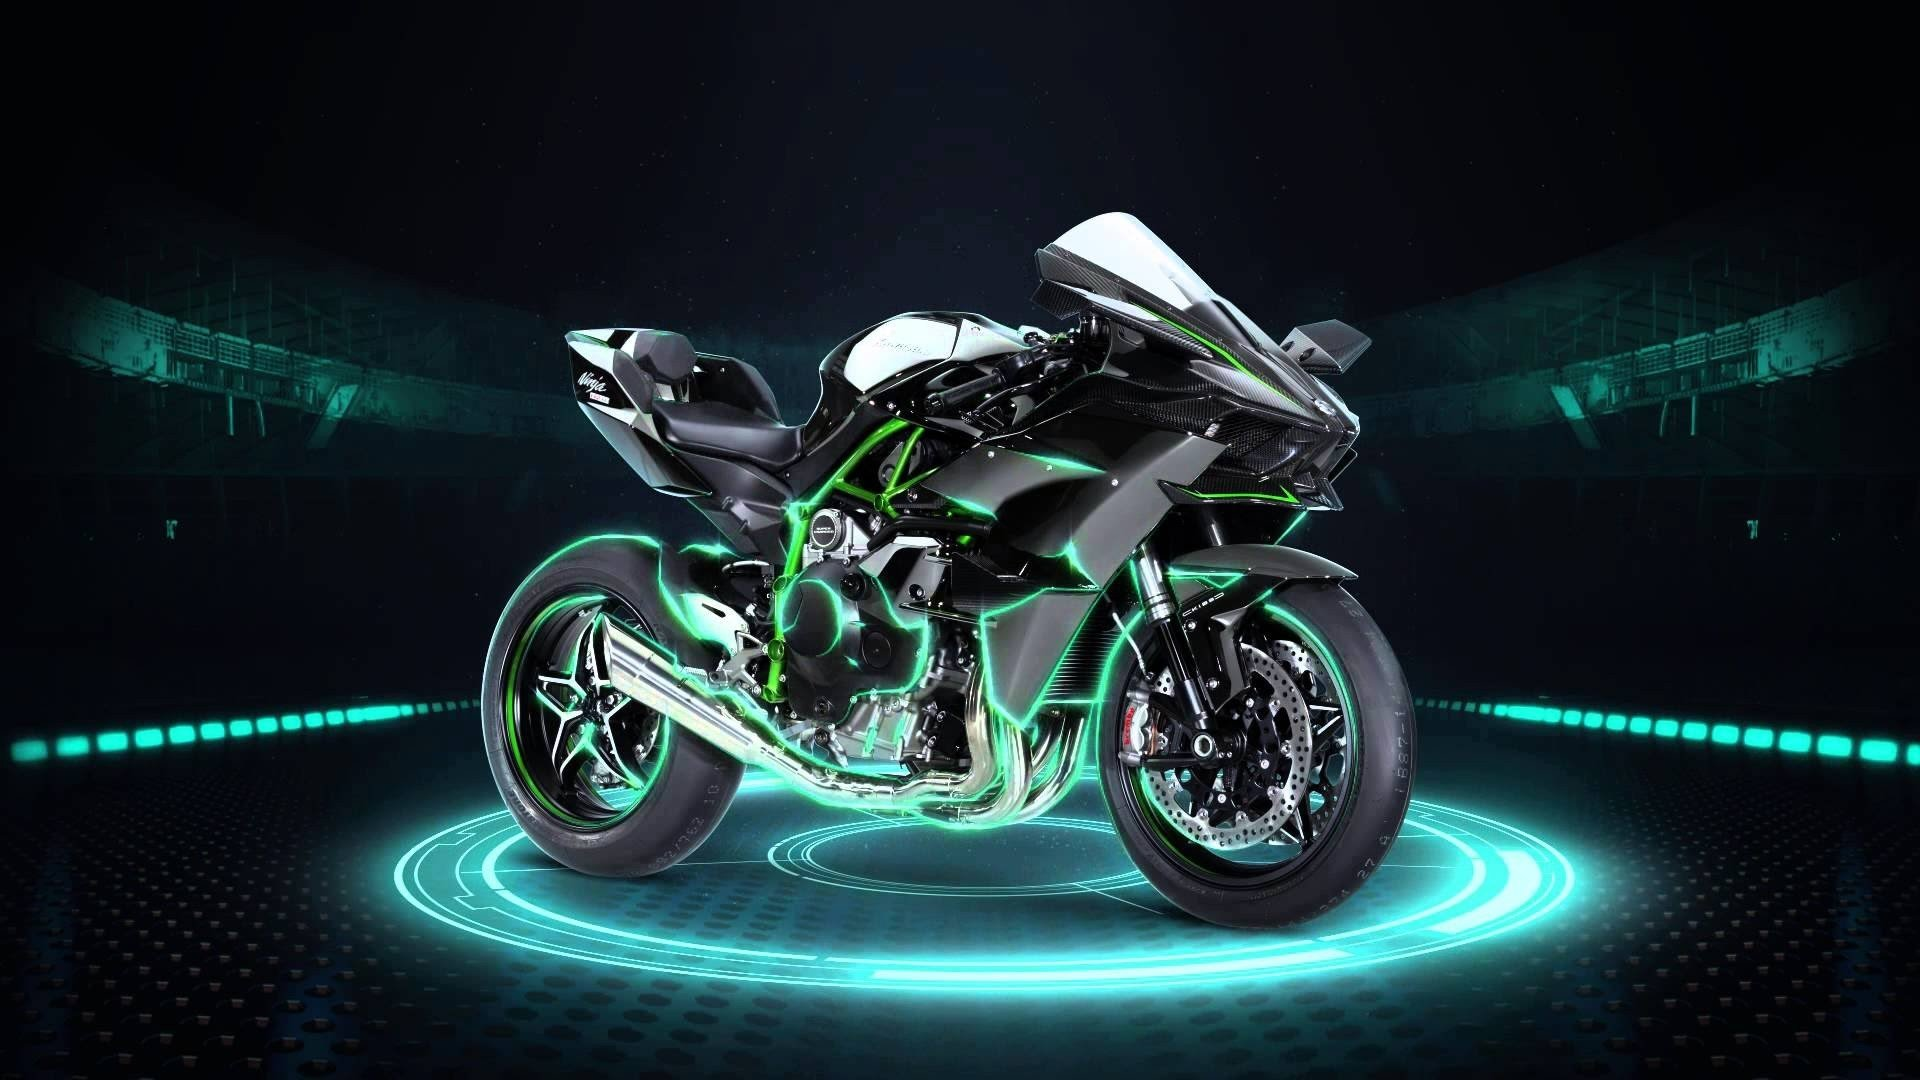 Kawasaki Kawasaki Ninja H2R HD Wallpapers  Desktop and